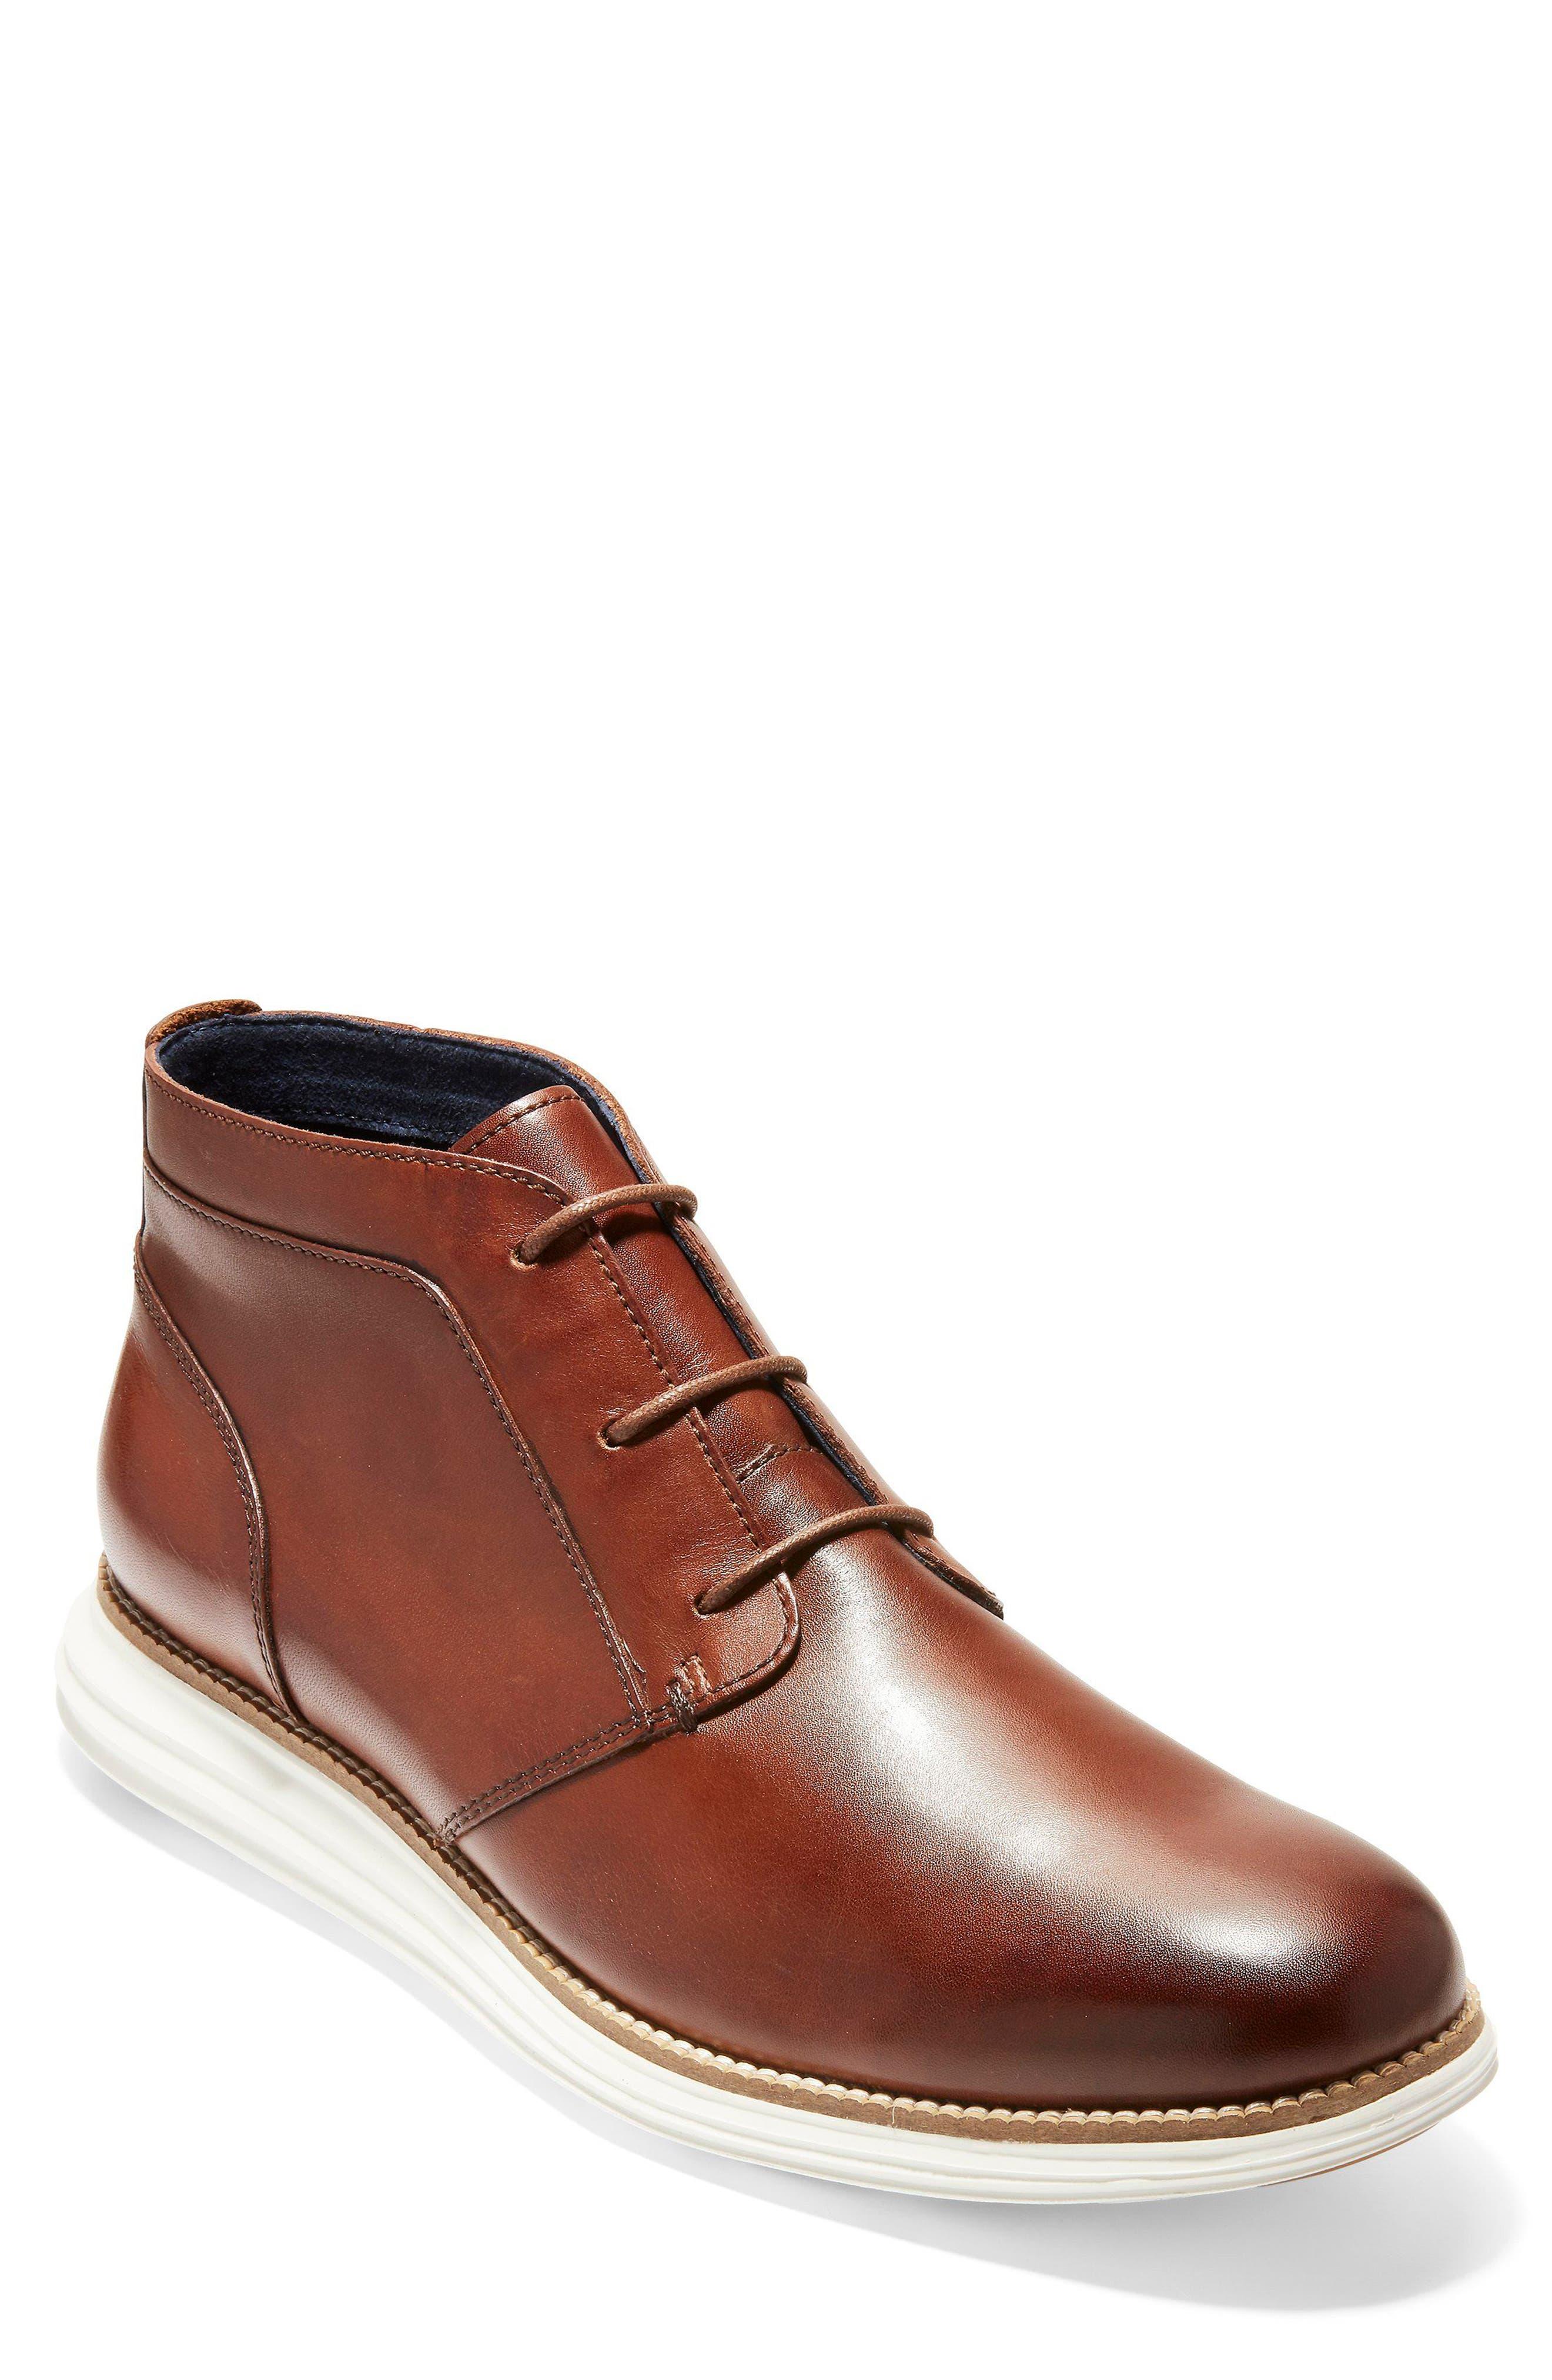 COLE HAAN Original Grand Chukka Boot, Main, color, 200